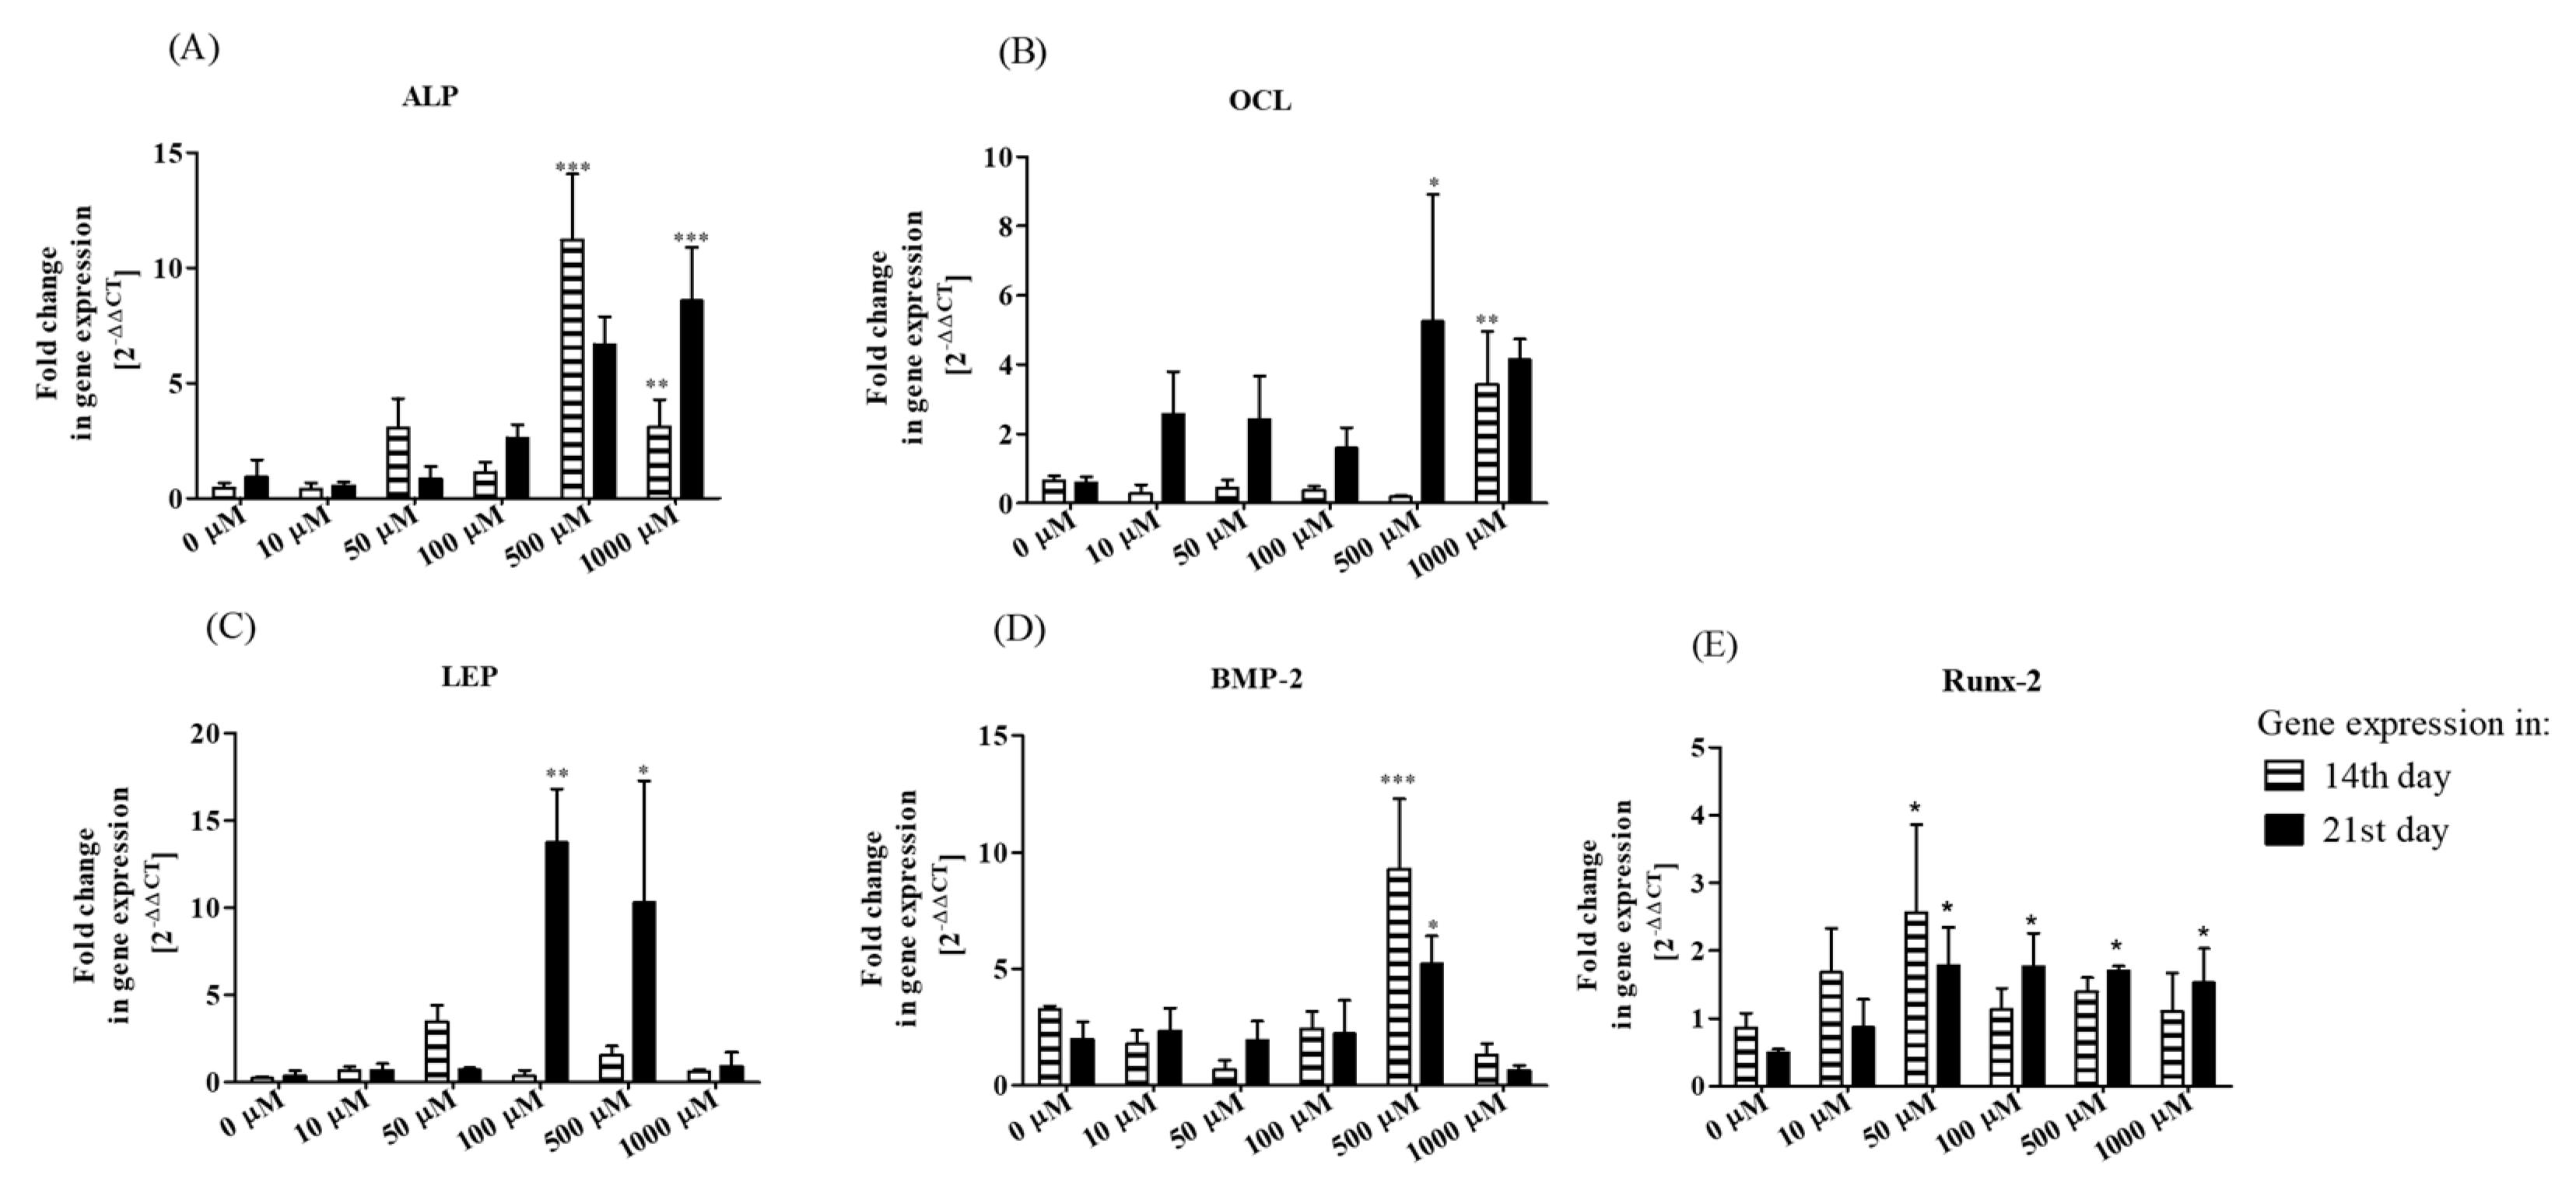 JCM | Free Full-Text | Metformin Promotes Osteogenic Differentiation